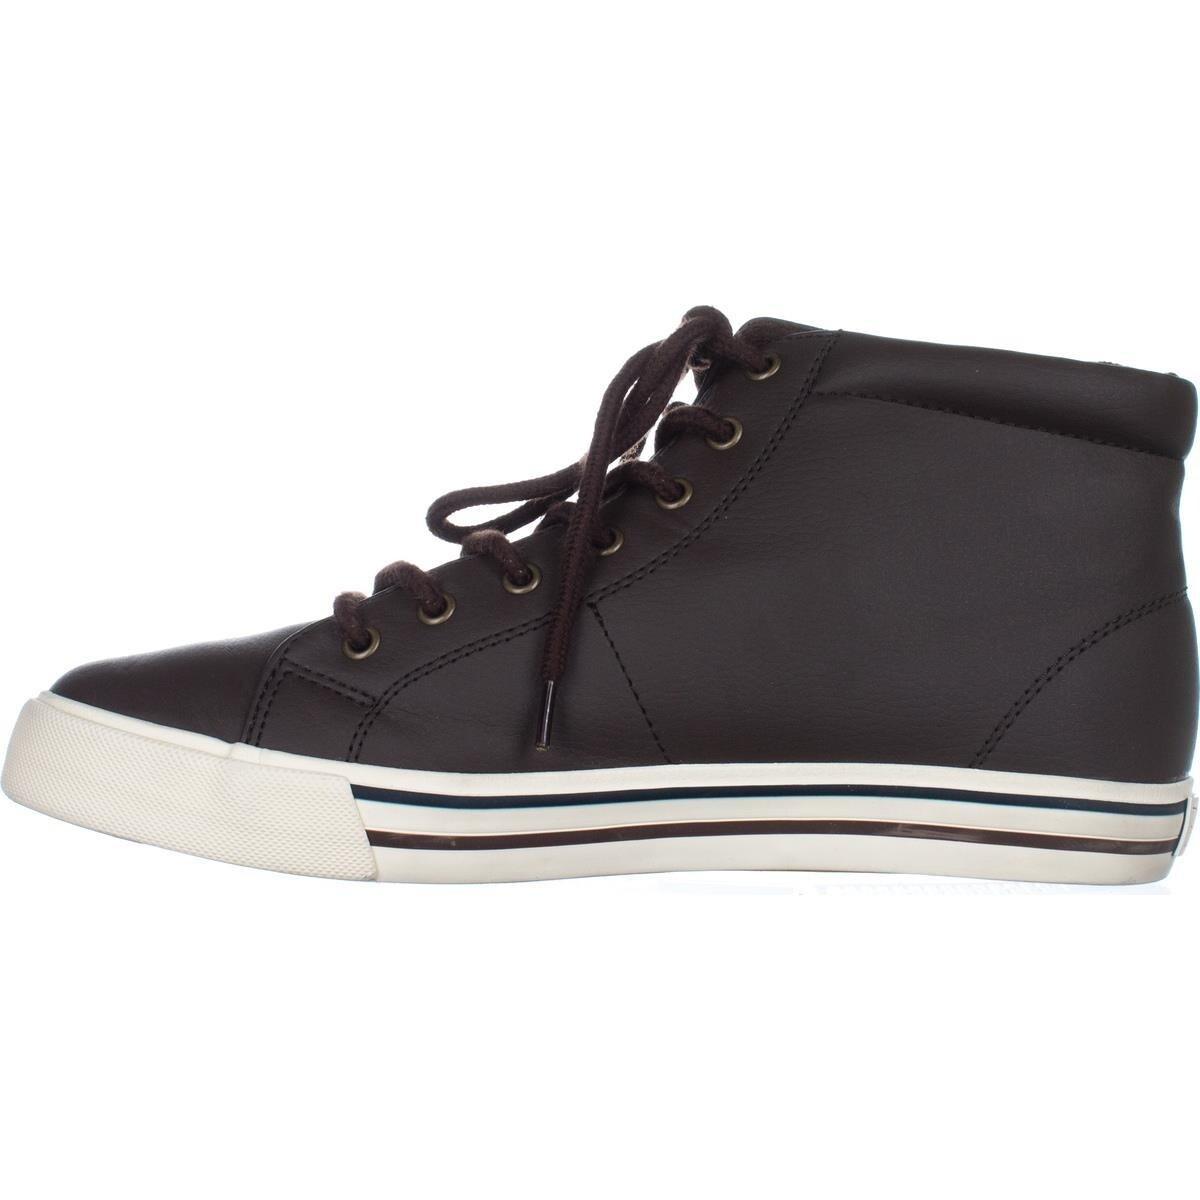 b354451b004c33 Shop Polo Ralph Lauren Scholar Boy s High-Top Sneakers